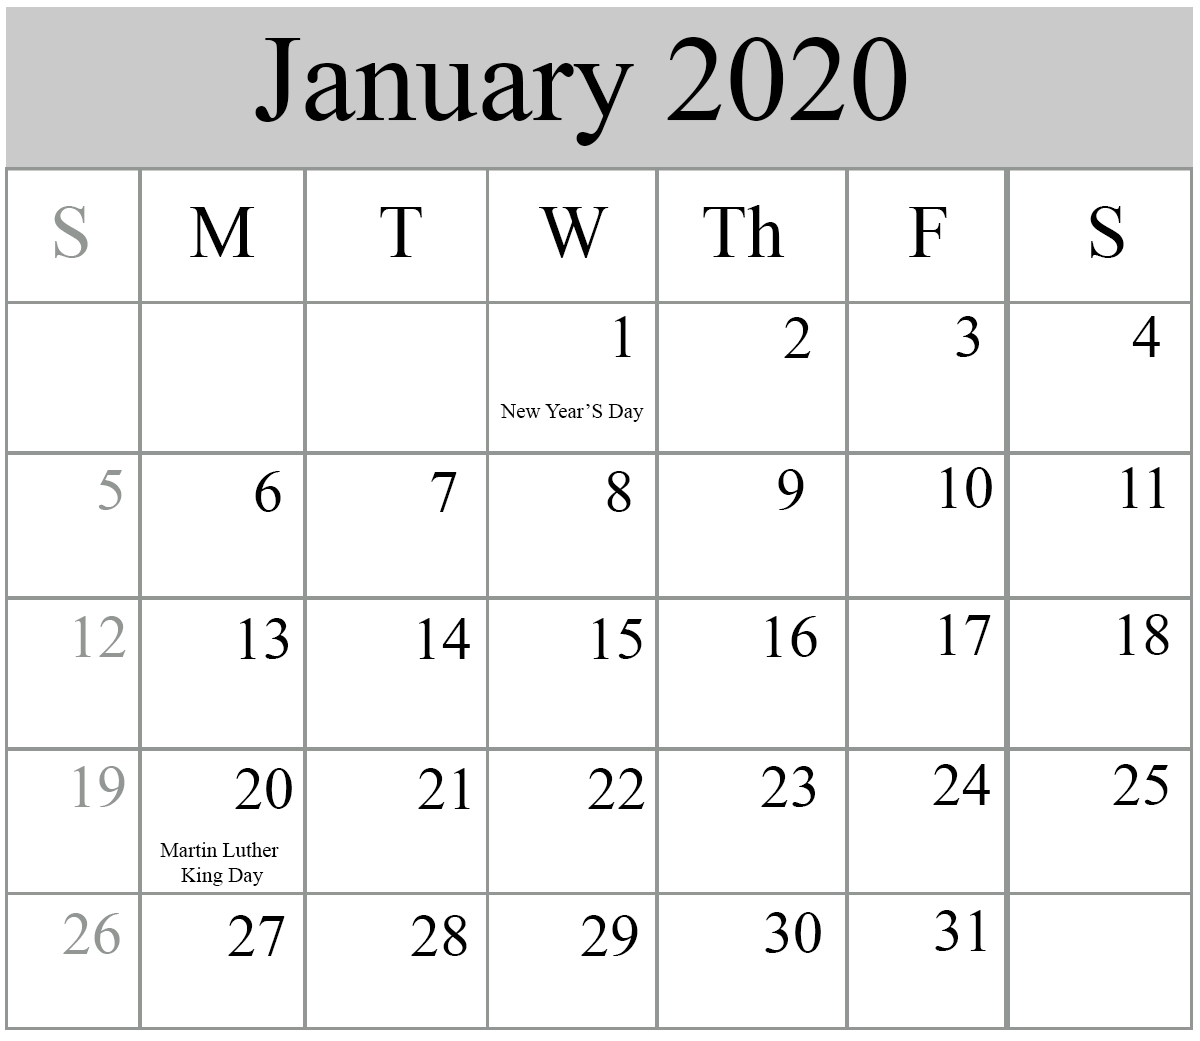 January-2020-Calendar-2 | How To Wiki-Wiki Calendar January 2020